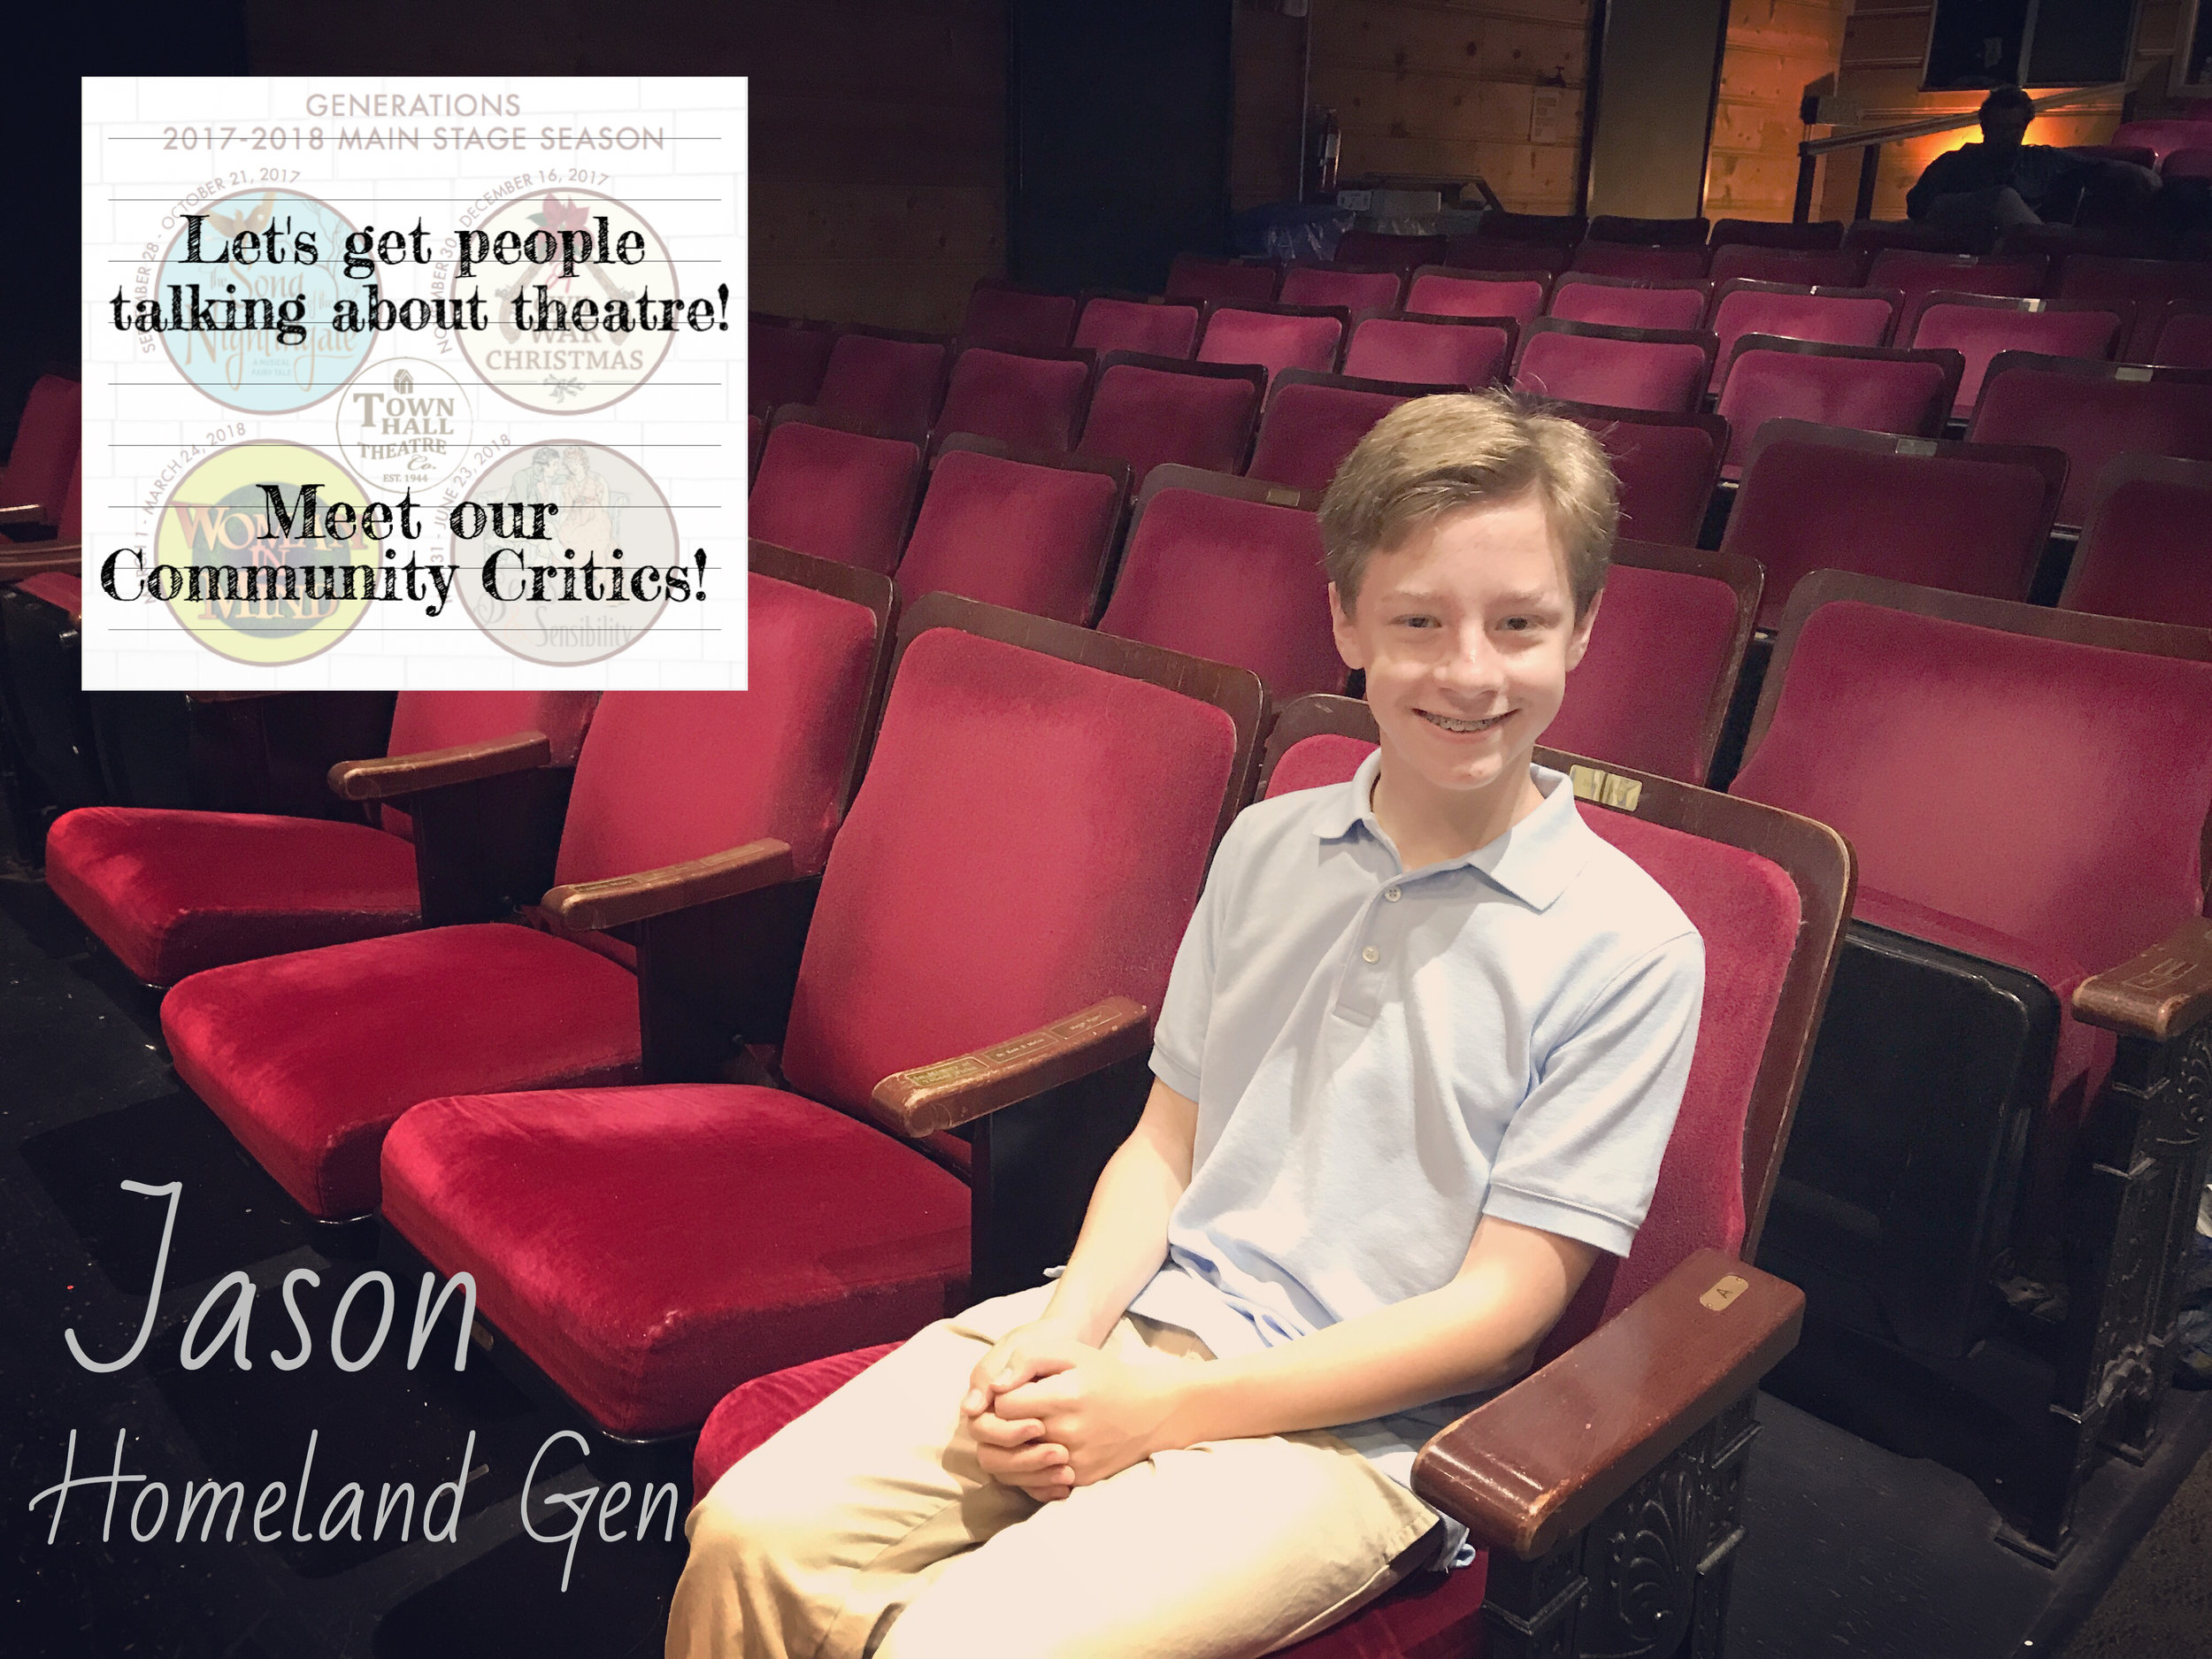 Jason - Bio coming soon!READ WHAT JASON HAS TO SAY ABOUT OUR UPCOMING SEASON!READ WHAT JASON HAS TO SAY ABOUT THE SONG OF THE NIGHTINGALE!READ WHAT JASON HAS TO SAY ABOUT WOMAN IN MIND!